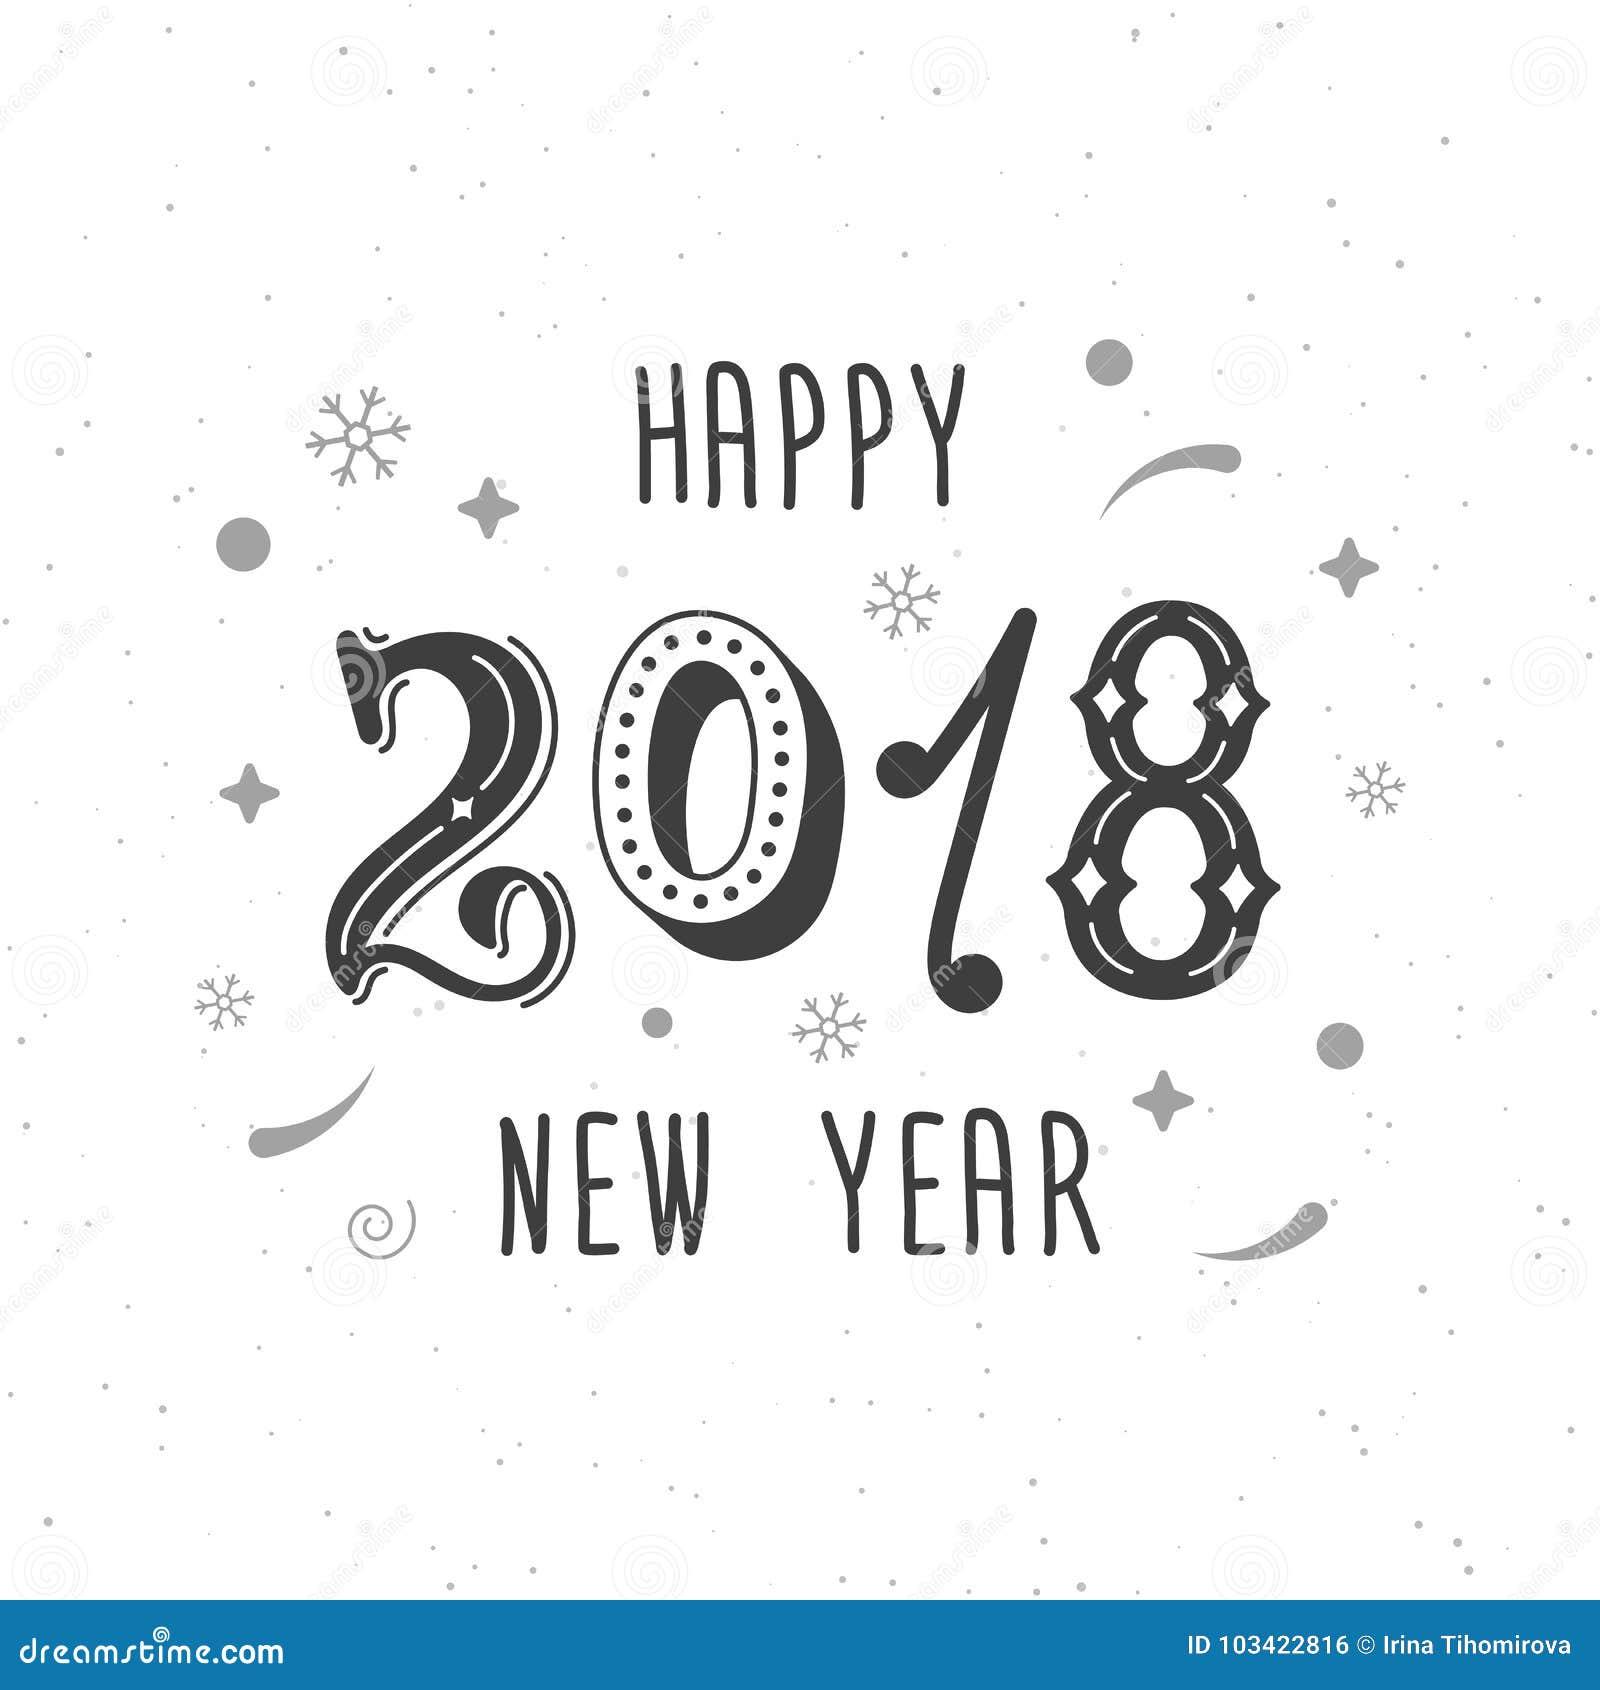 happy new year 2018 hand written modern brush lettering clipart